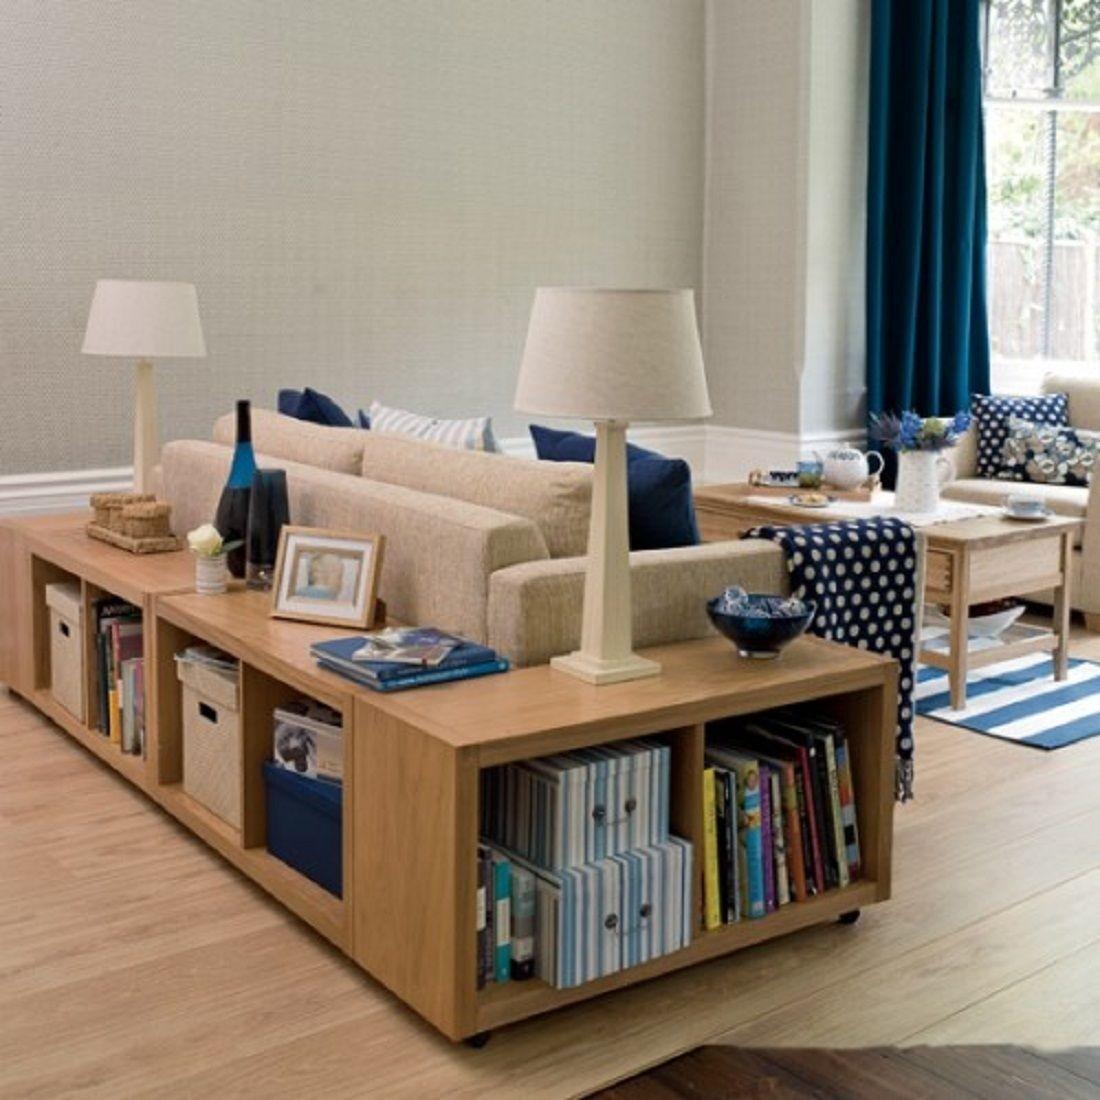 Superbe End Table Bookshelf 3